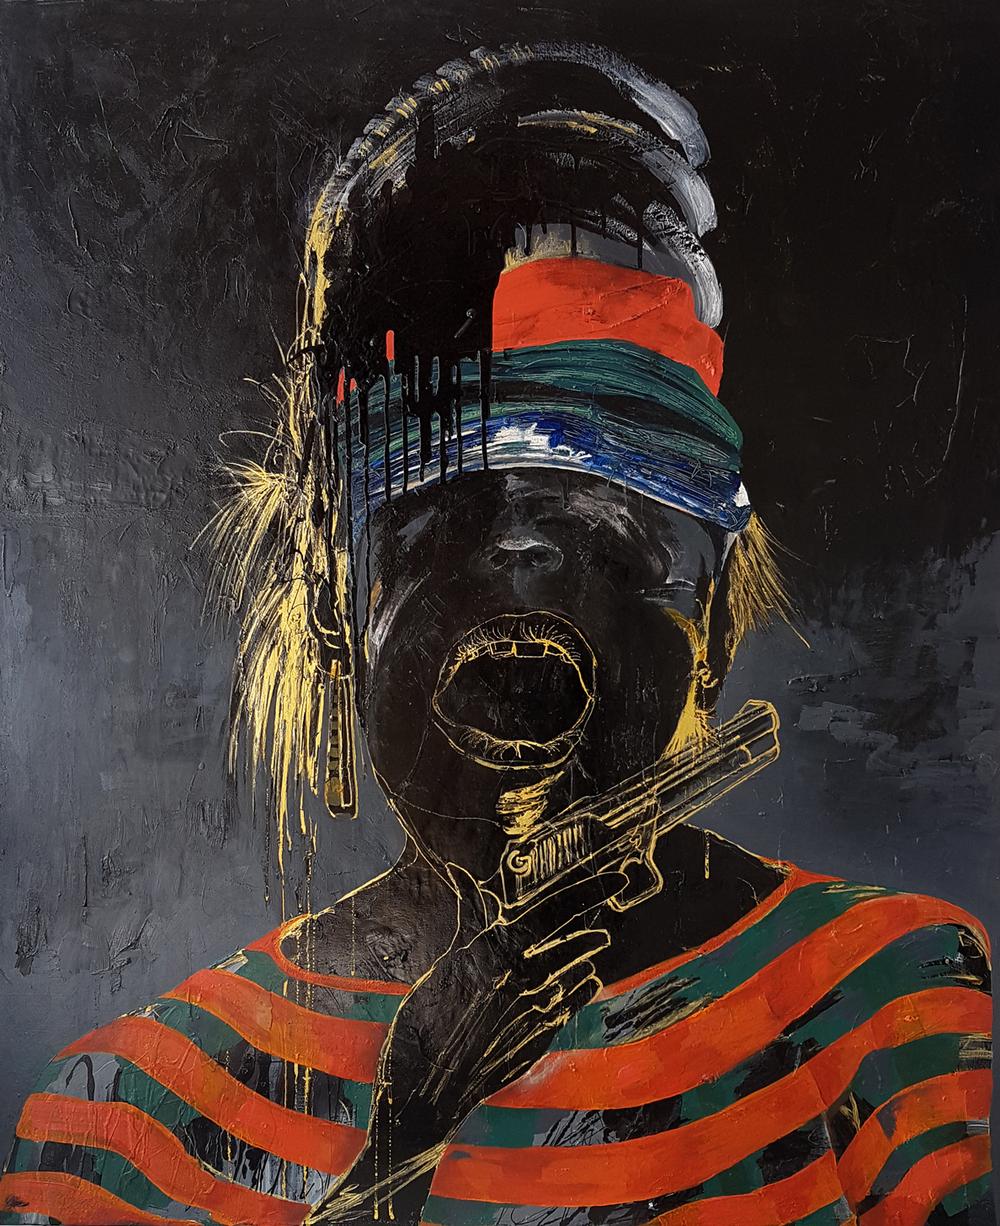 Black Minute / Oil on canvas / 150 x 100 cm / 2017